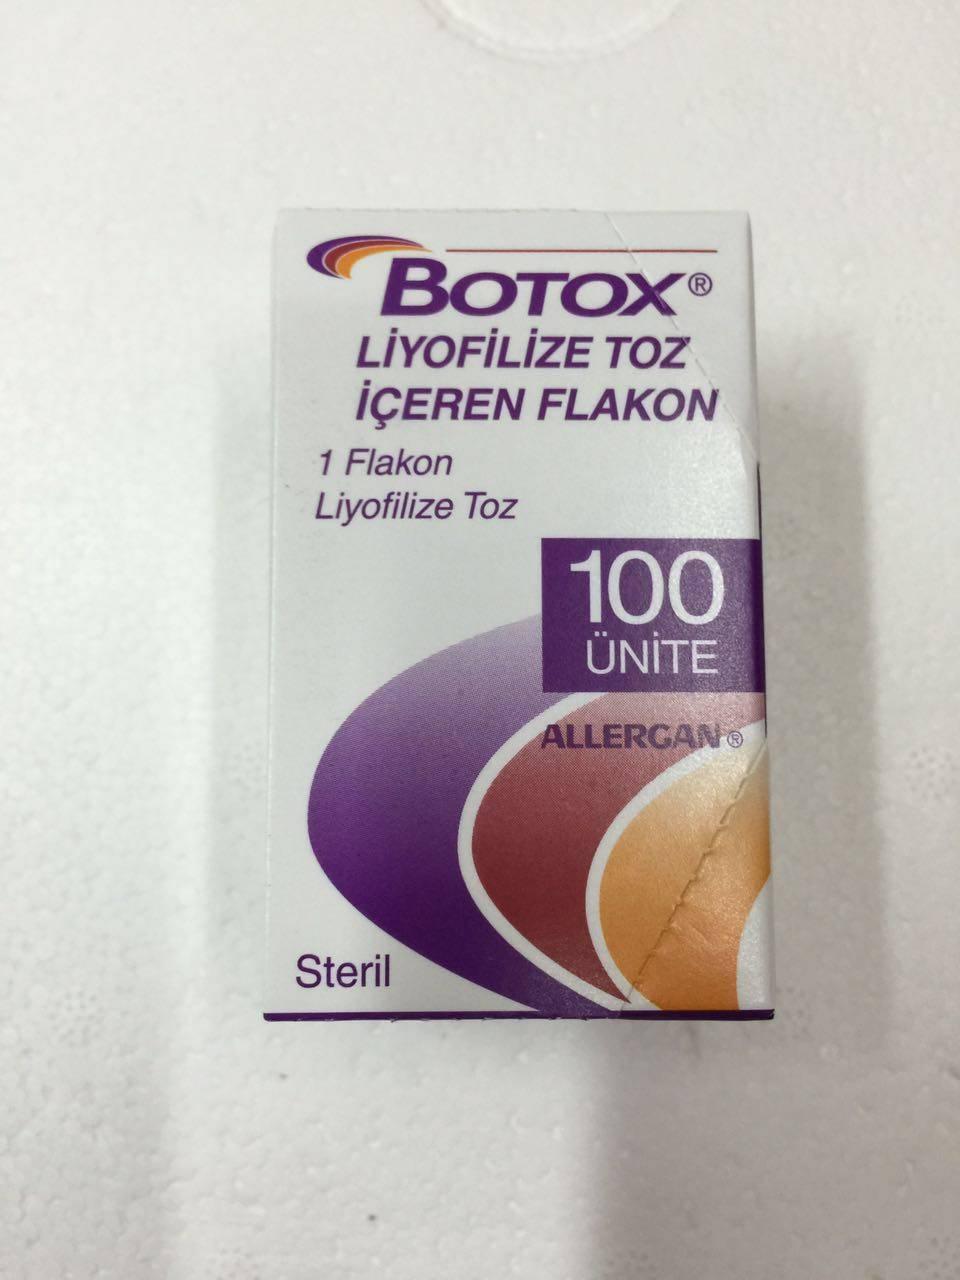 Botox Allergan 100 iu